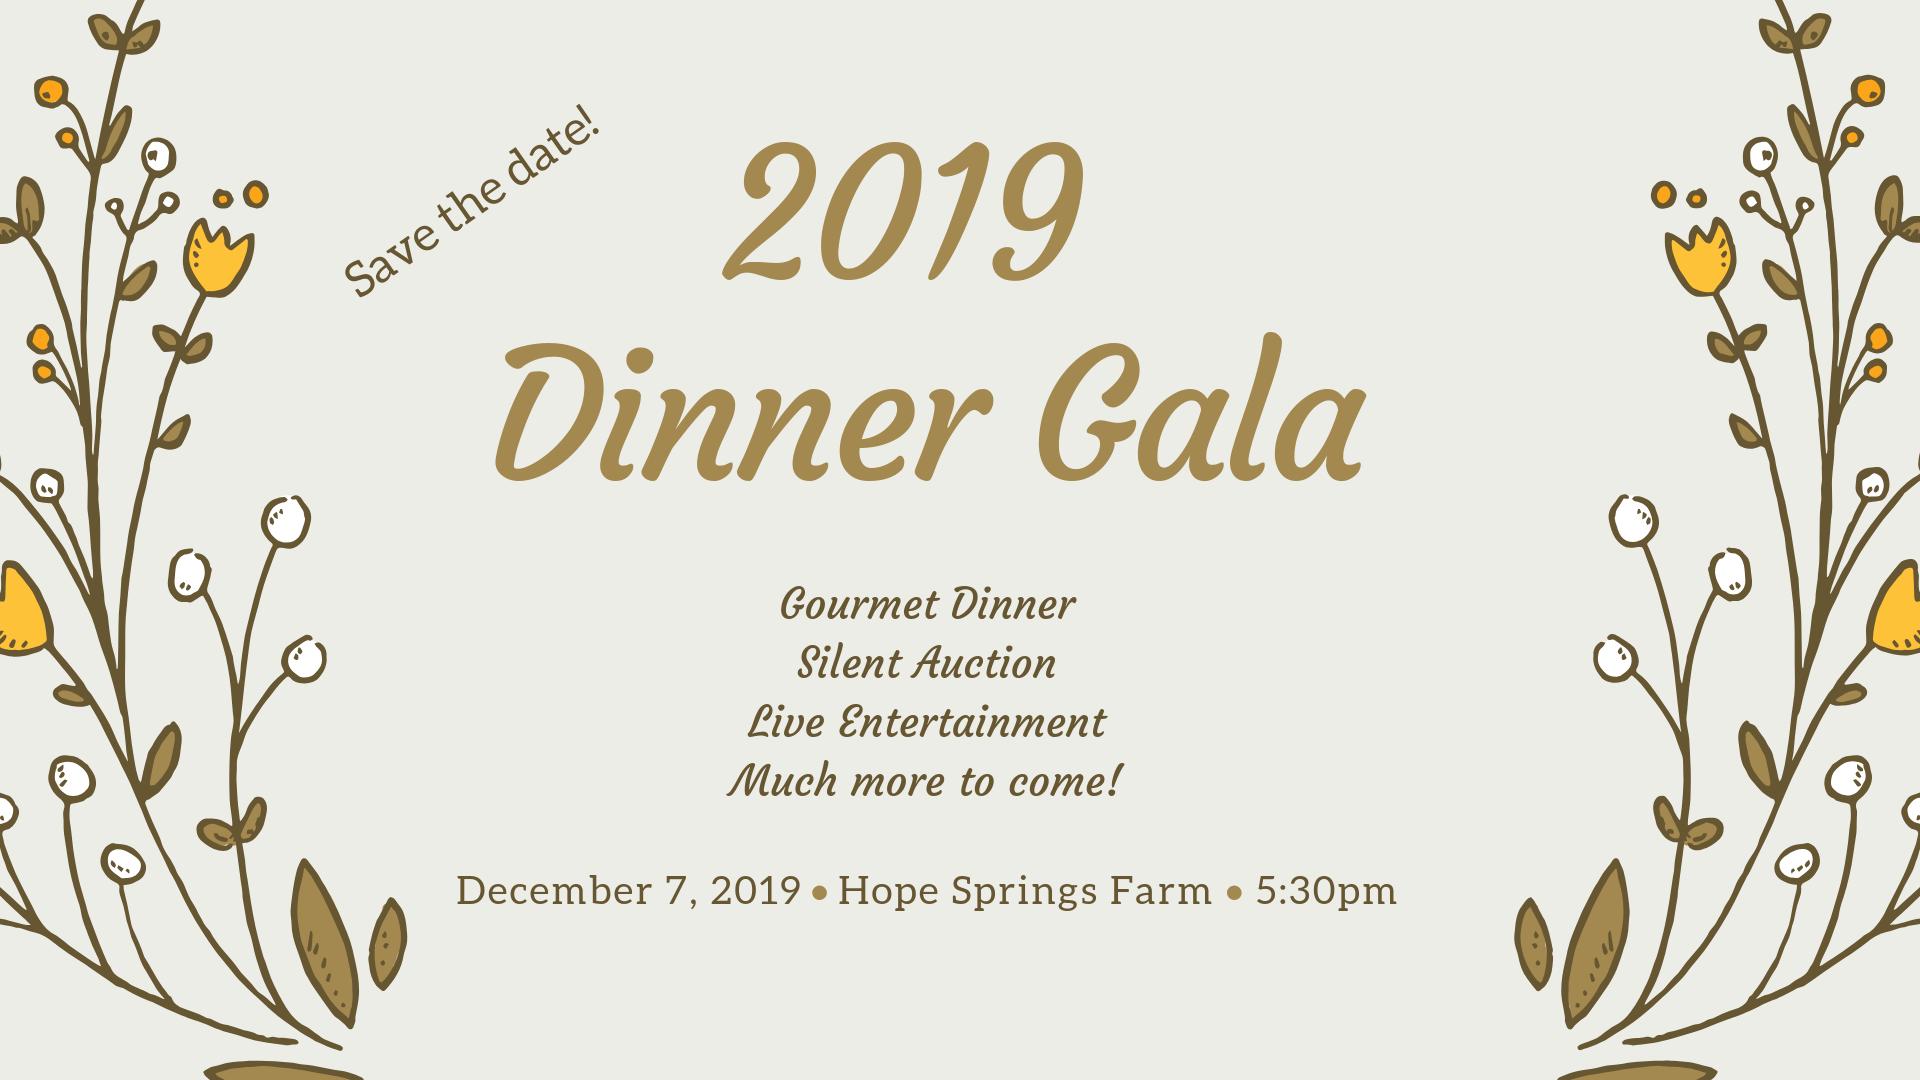 Dinner gala in Springfield, MO